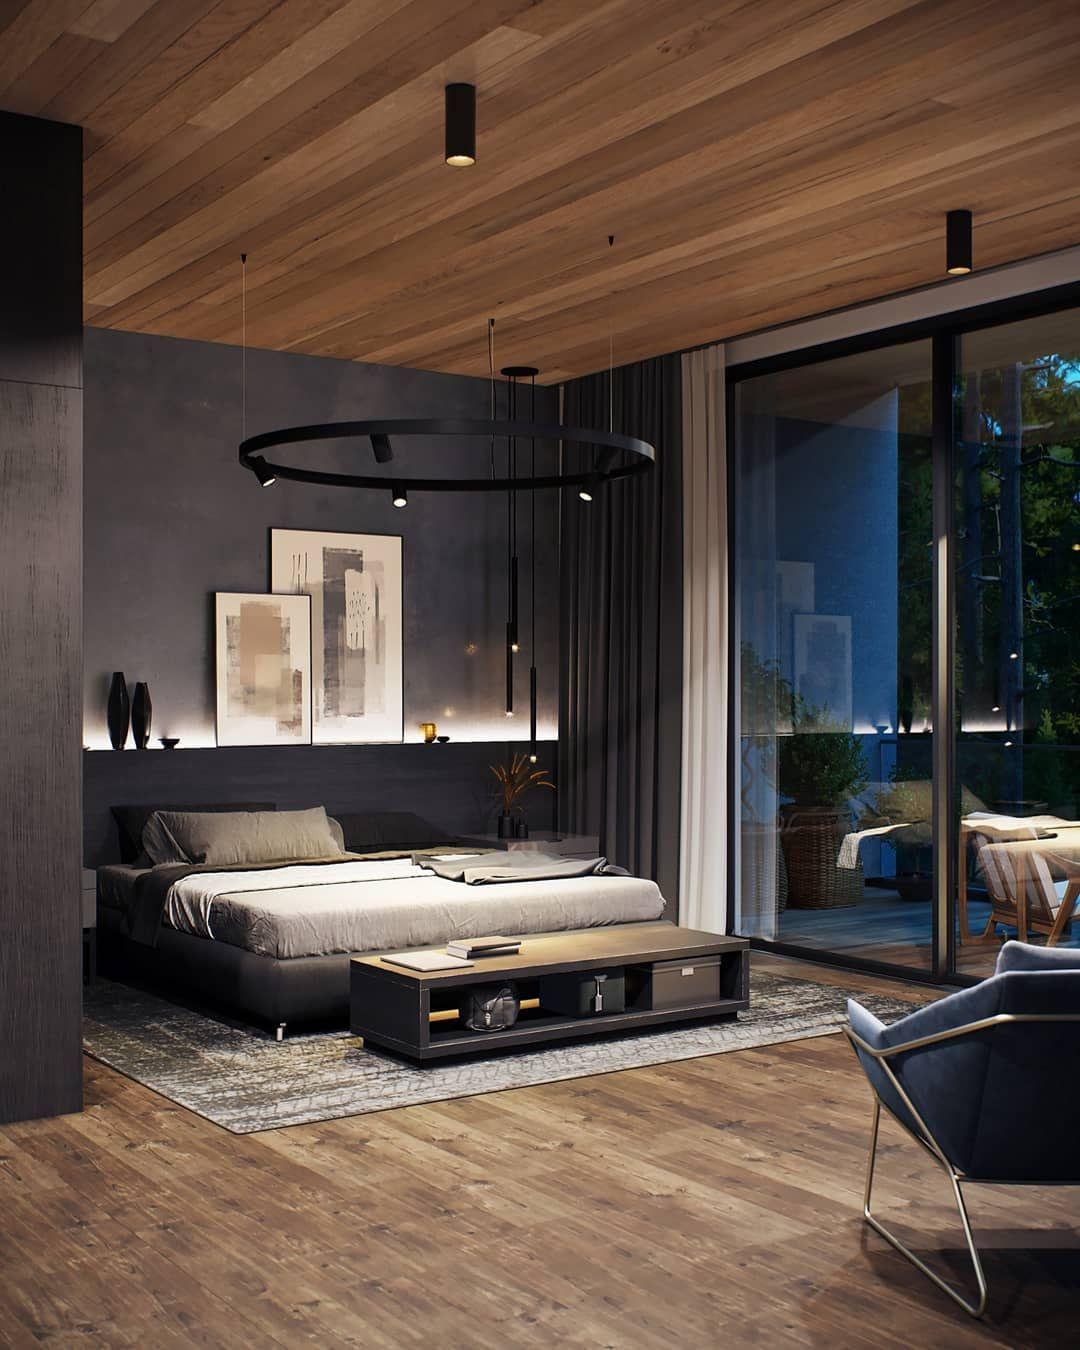 Surprising New The 10 Best Bedrooms In The World Bedroom Master Interior Design Ideas Oteneahmetsinanyavuzinfo